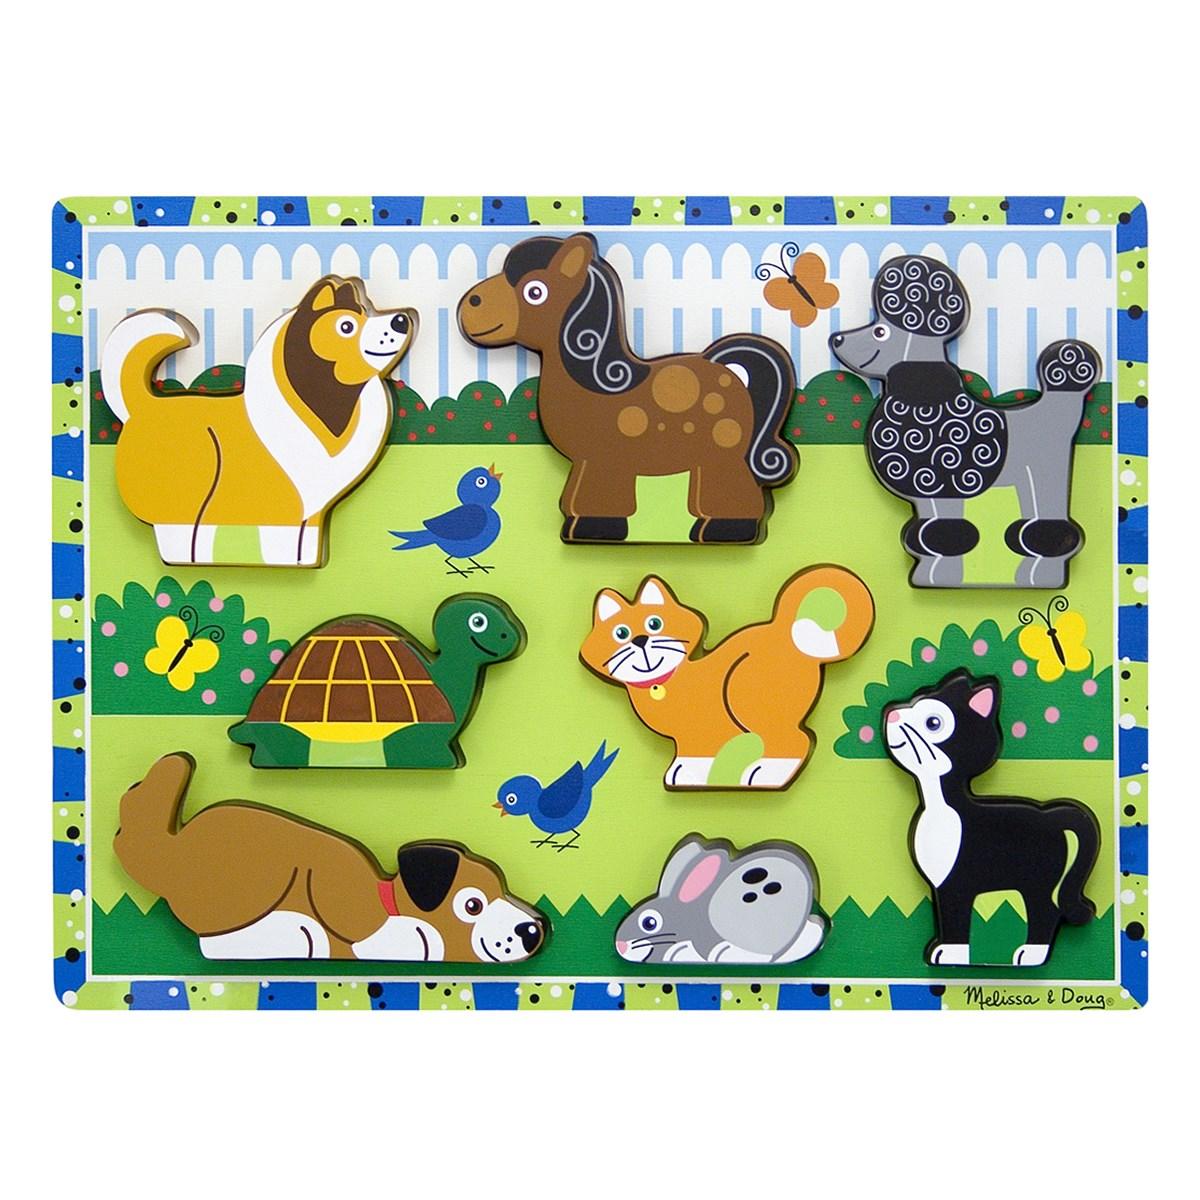 Melissa & Doug Wooden Chunky Puzzle Scene - Pets